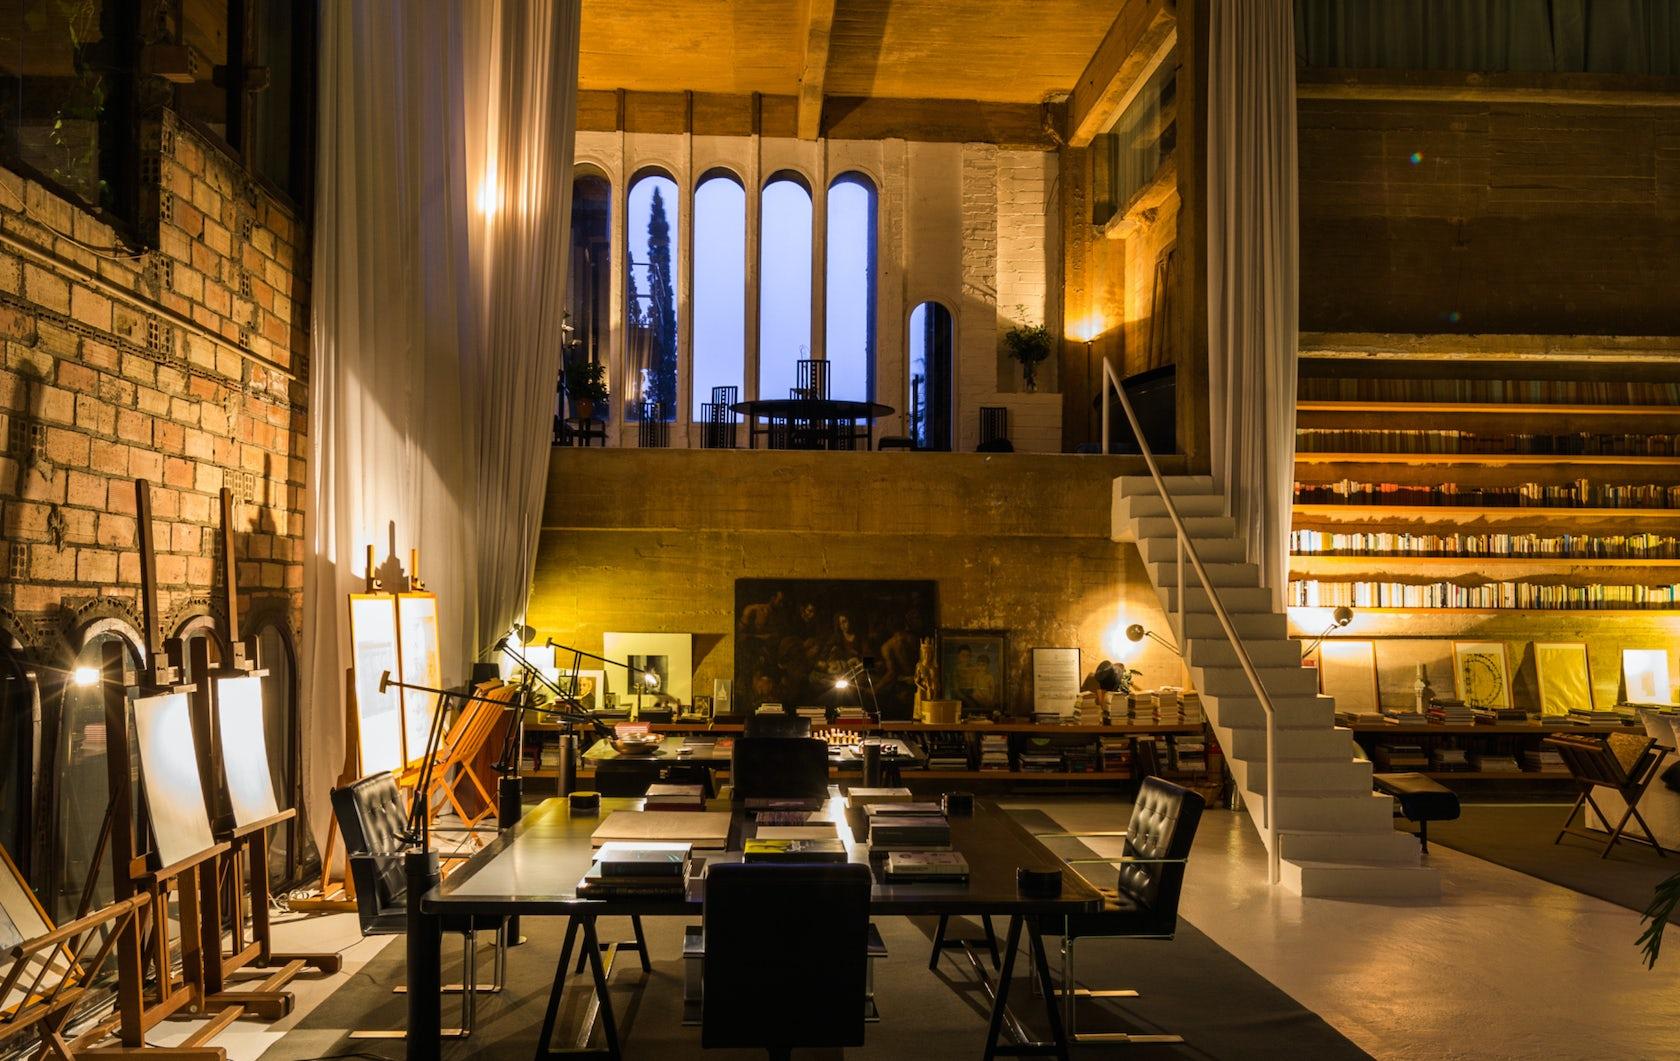 ricardo bofill taller de arquitectura headquarters architizer. Black Bedroom Furniture Sets. Home Design Ideas